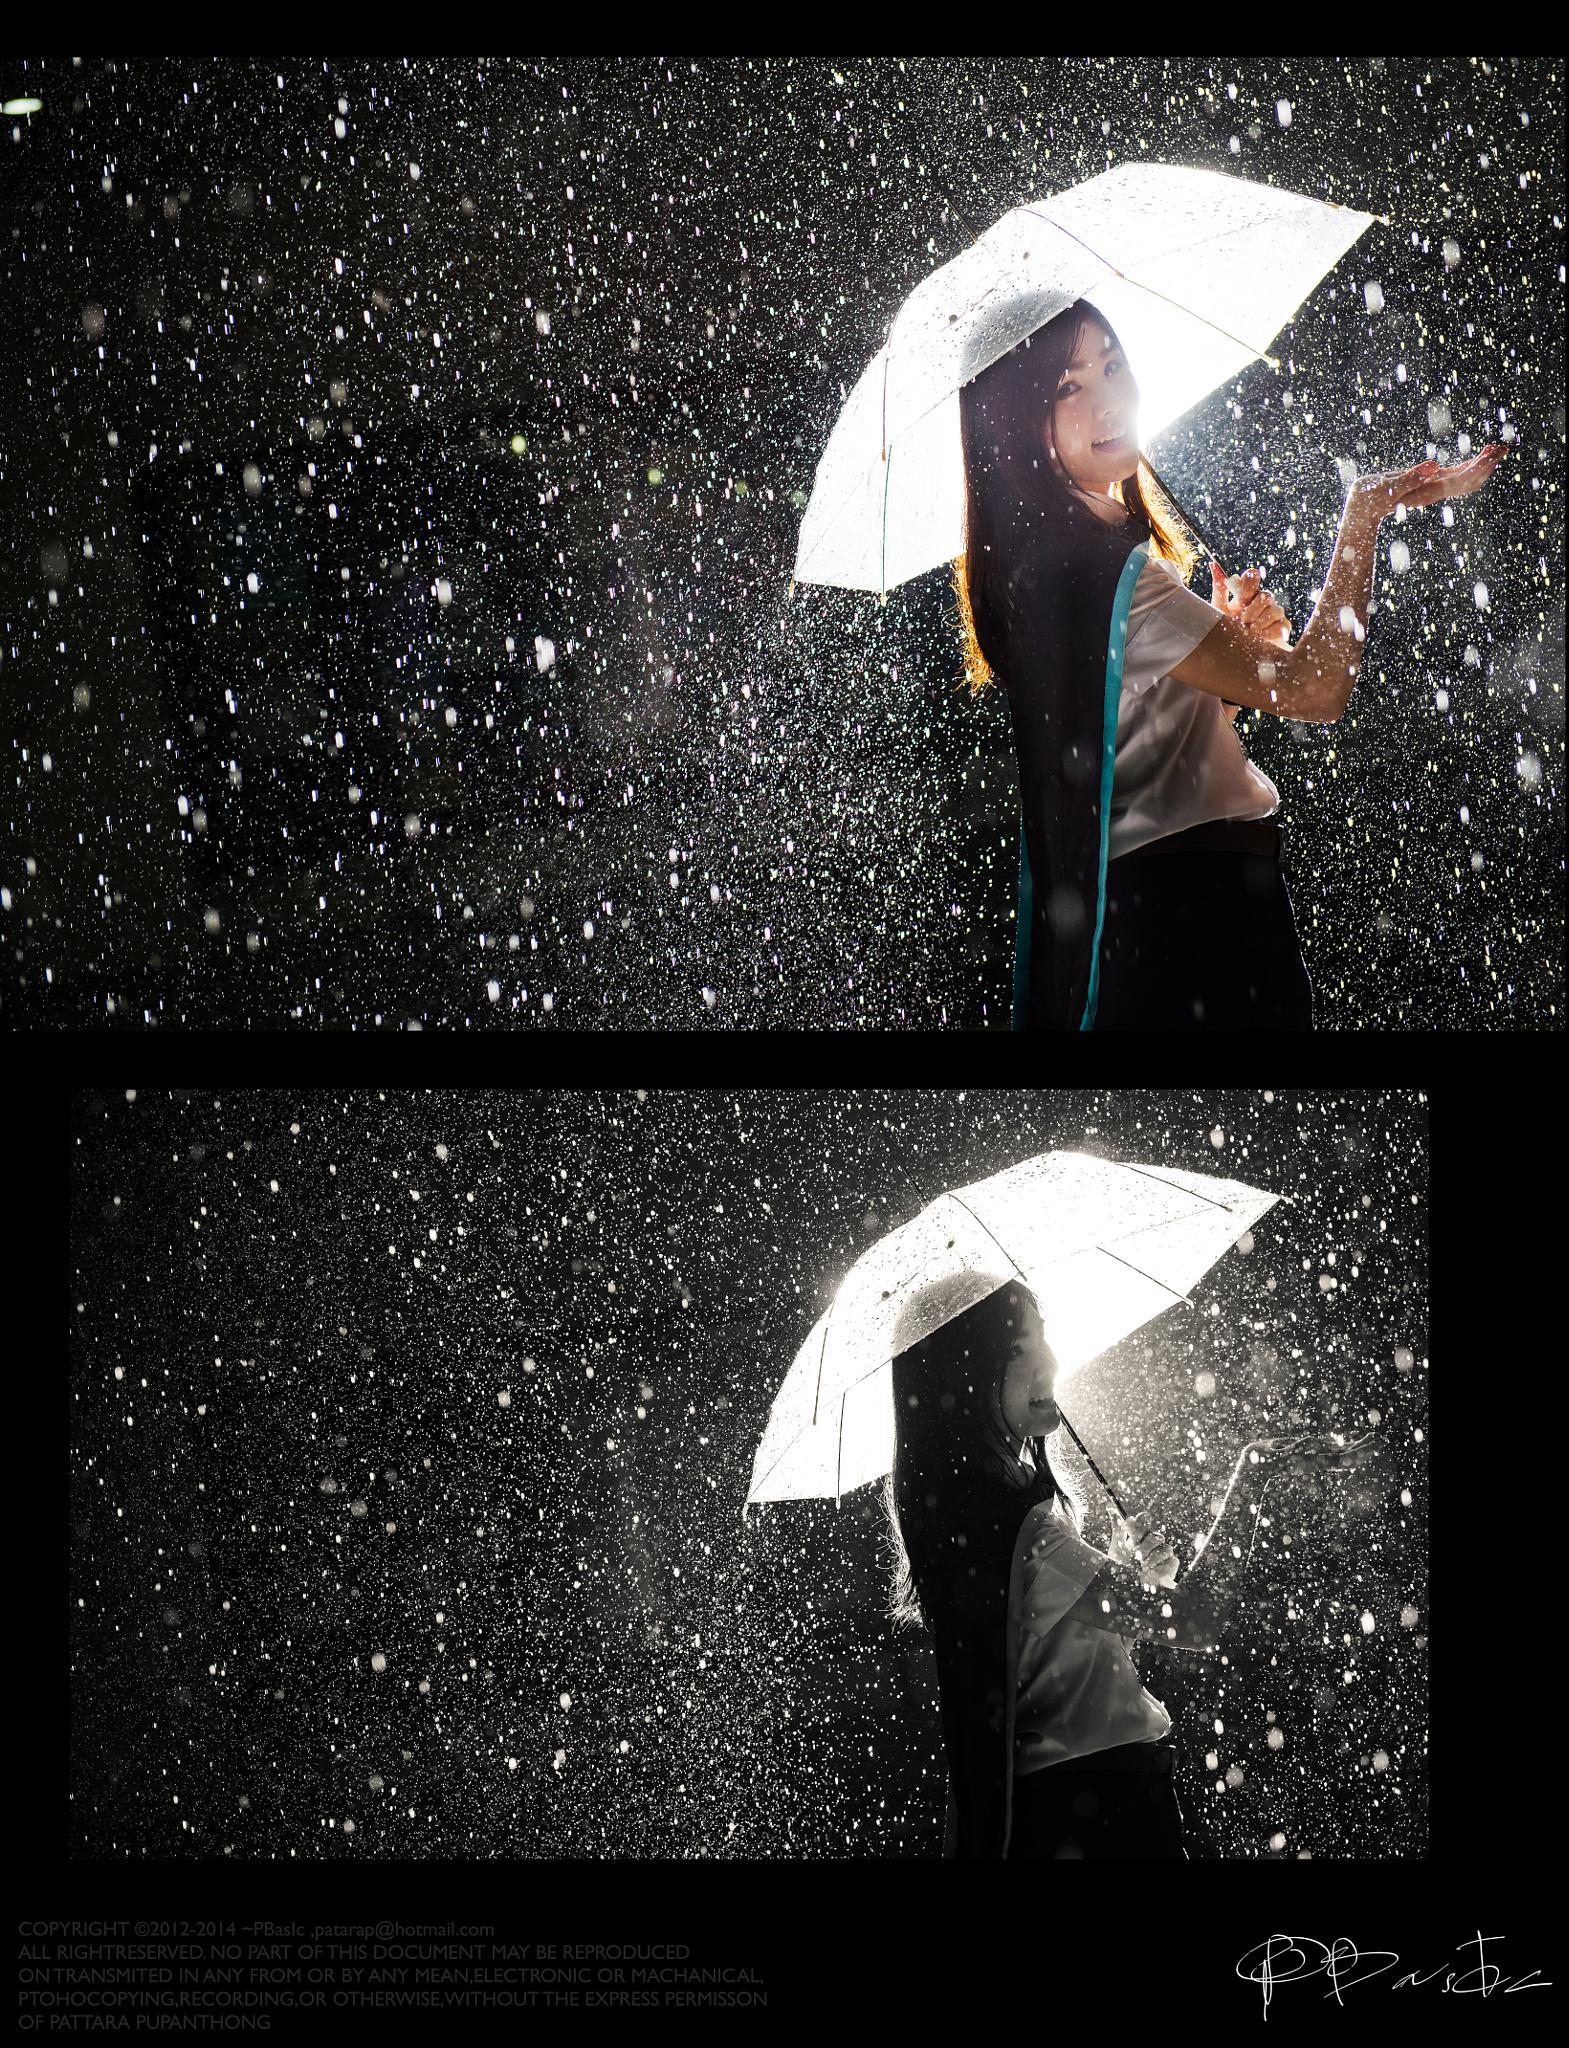 rainning day by pbasic.np